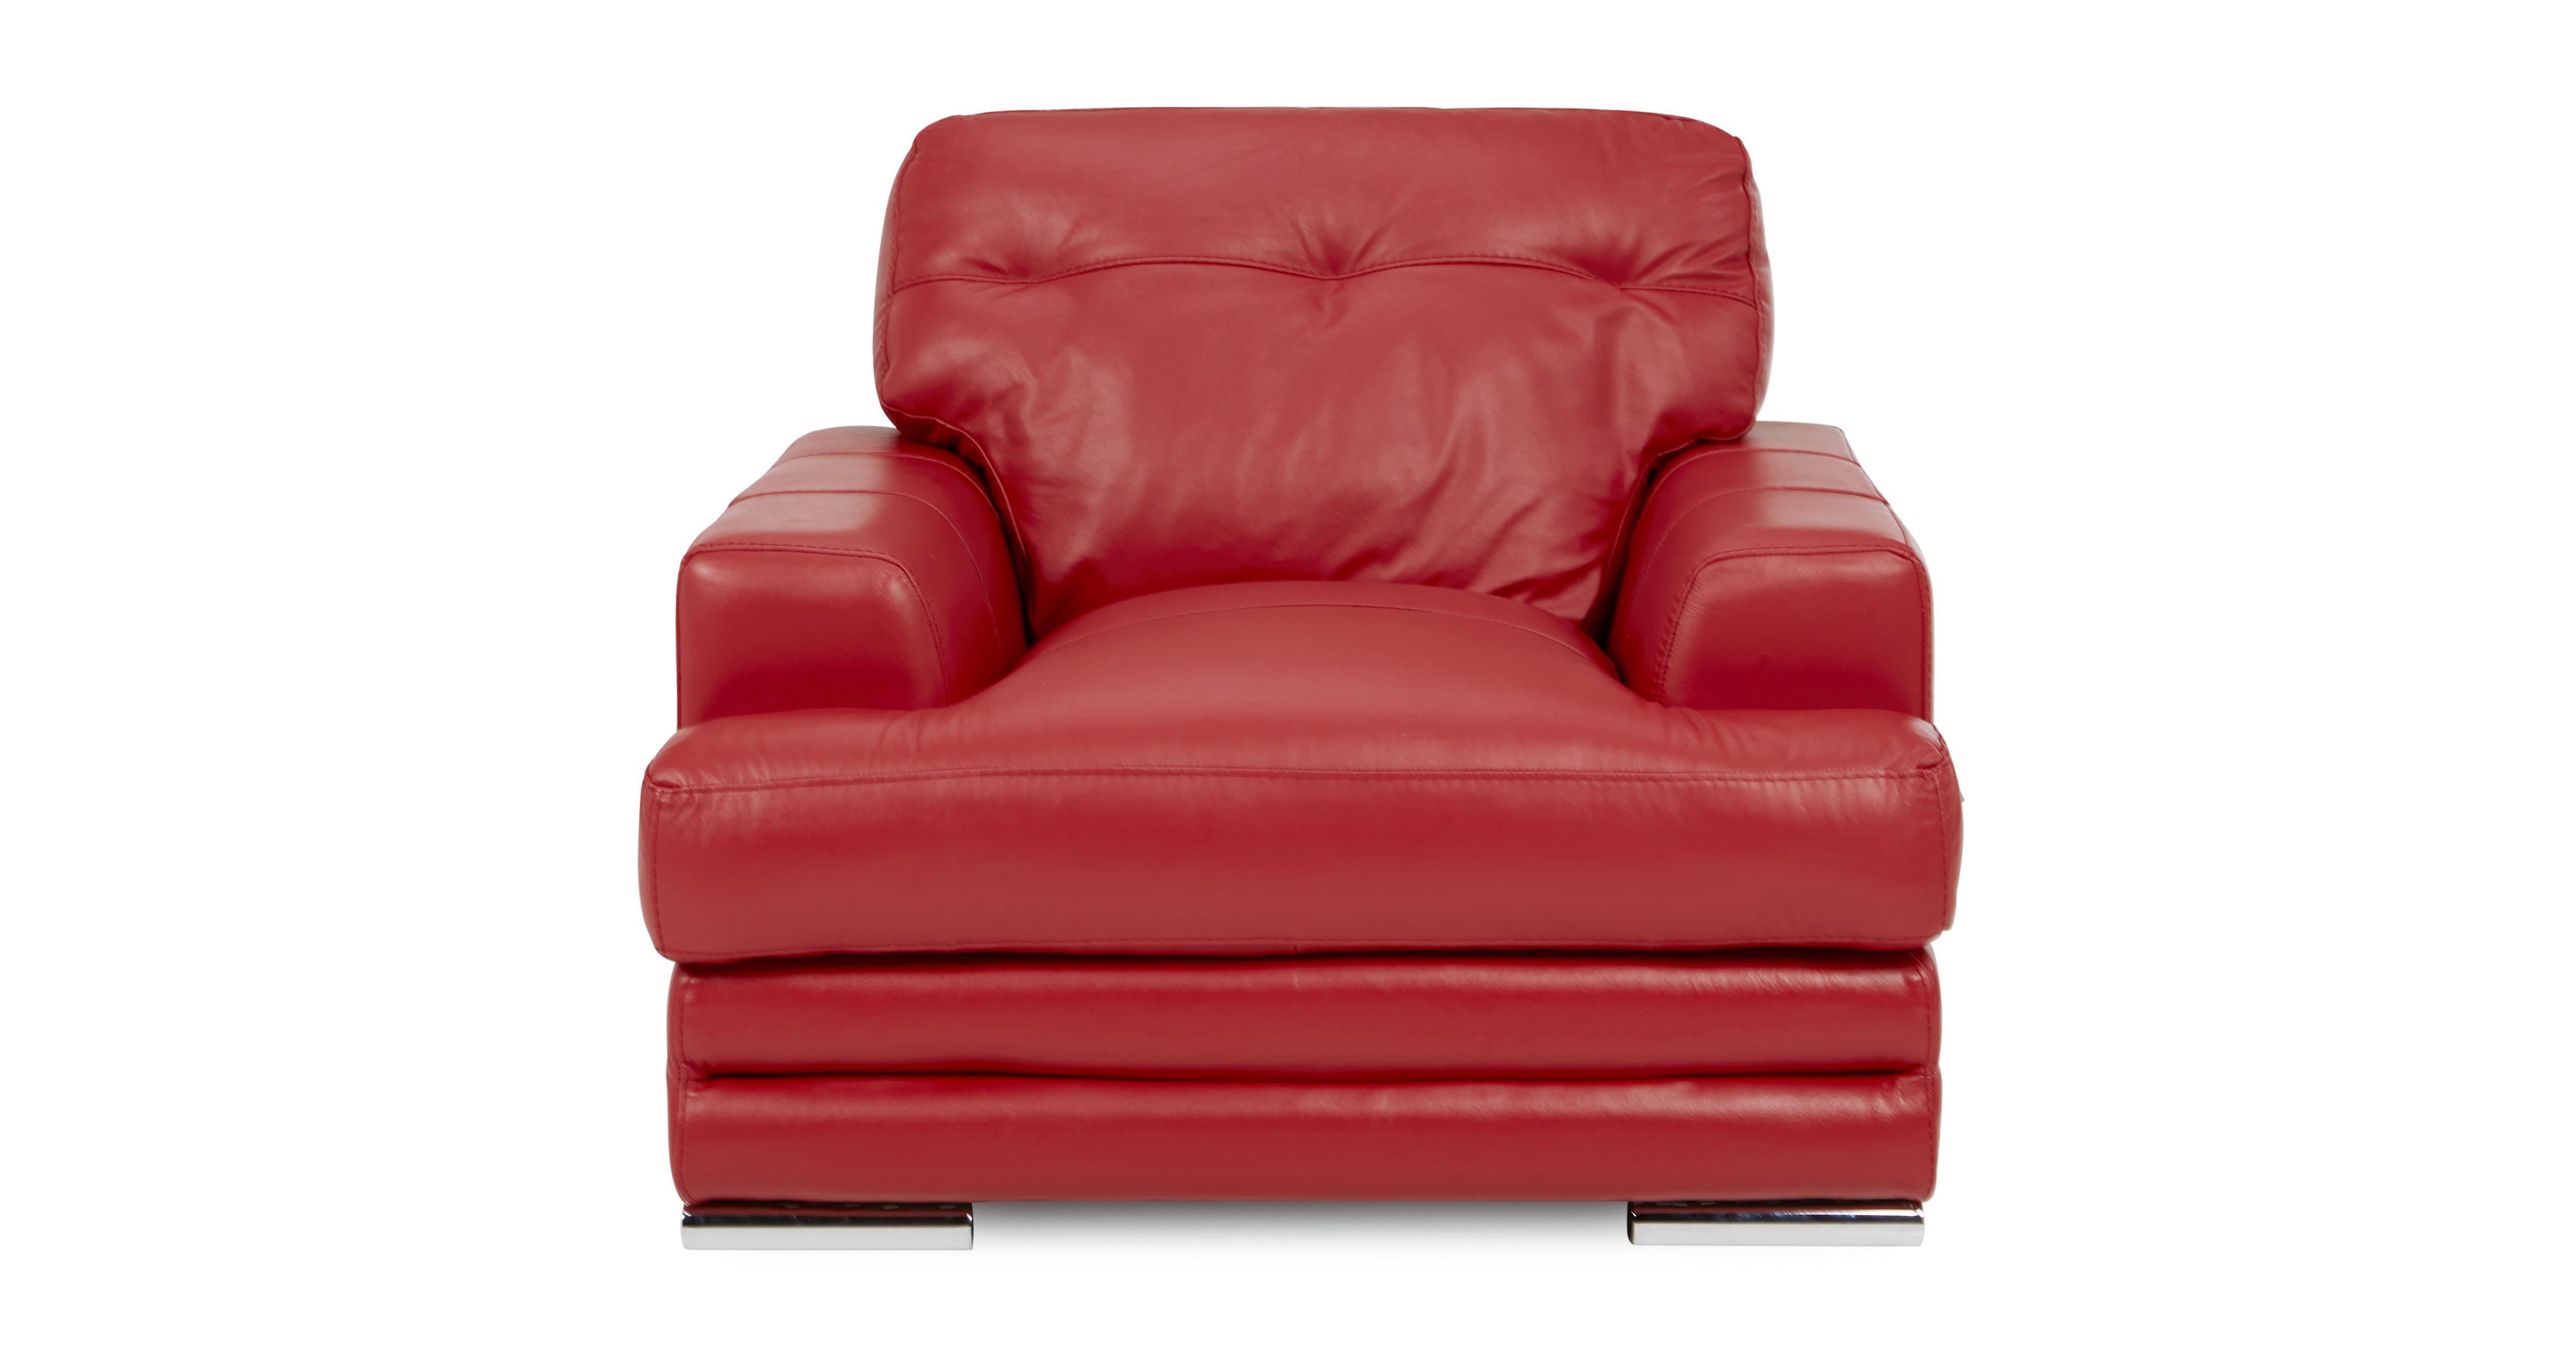 Quantum Clearance Left Hand Corner Sofa Chair & Footstool Venezia